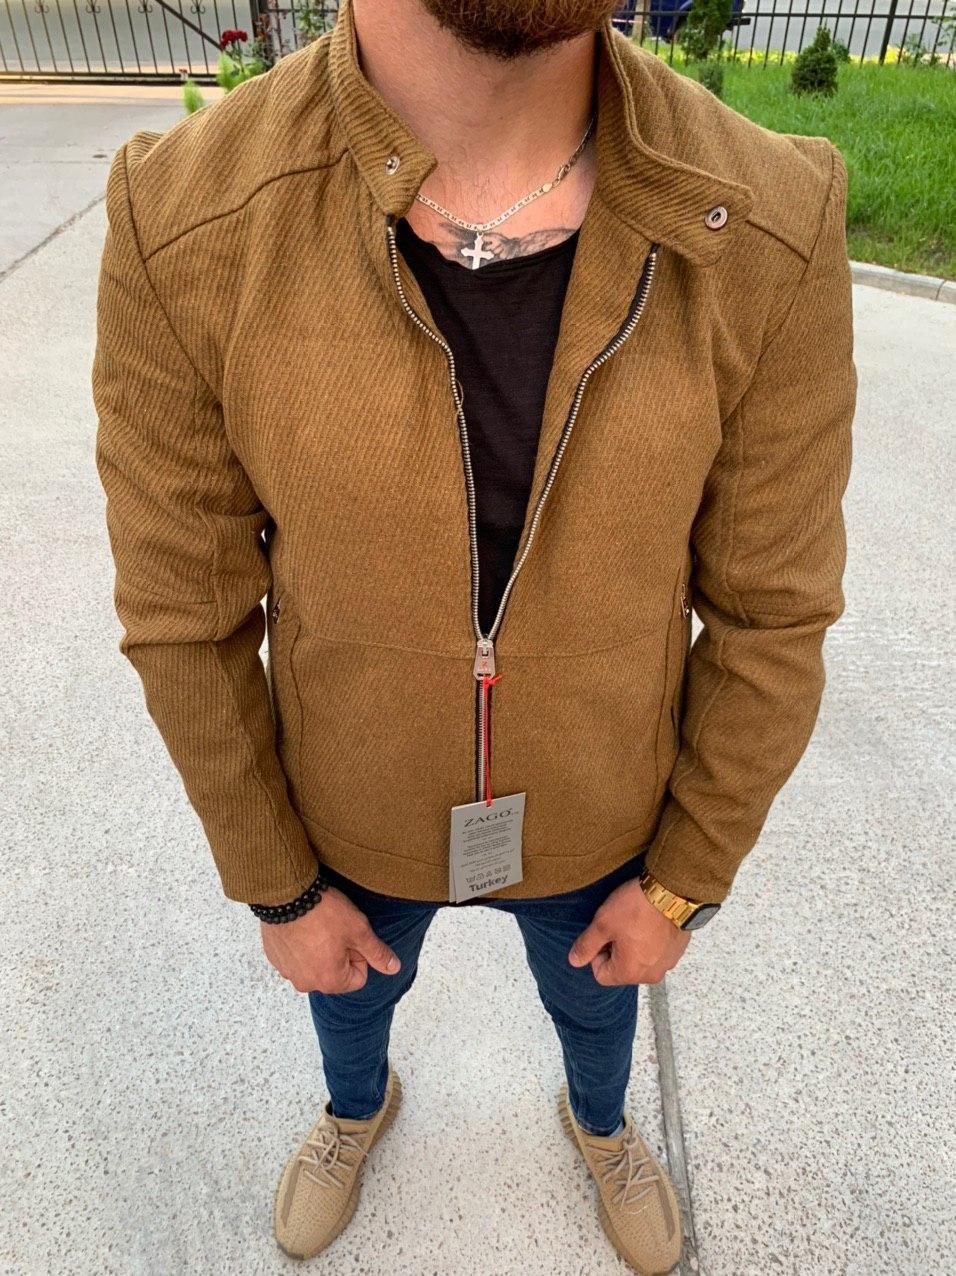 Мужская куртка M460 горчичная